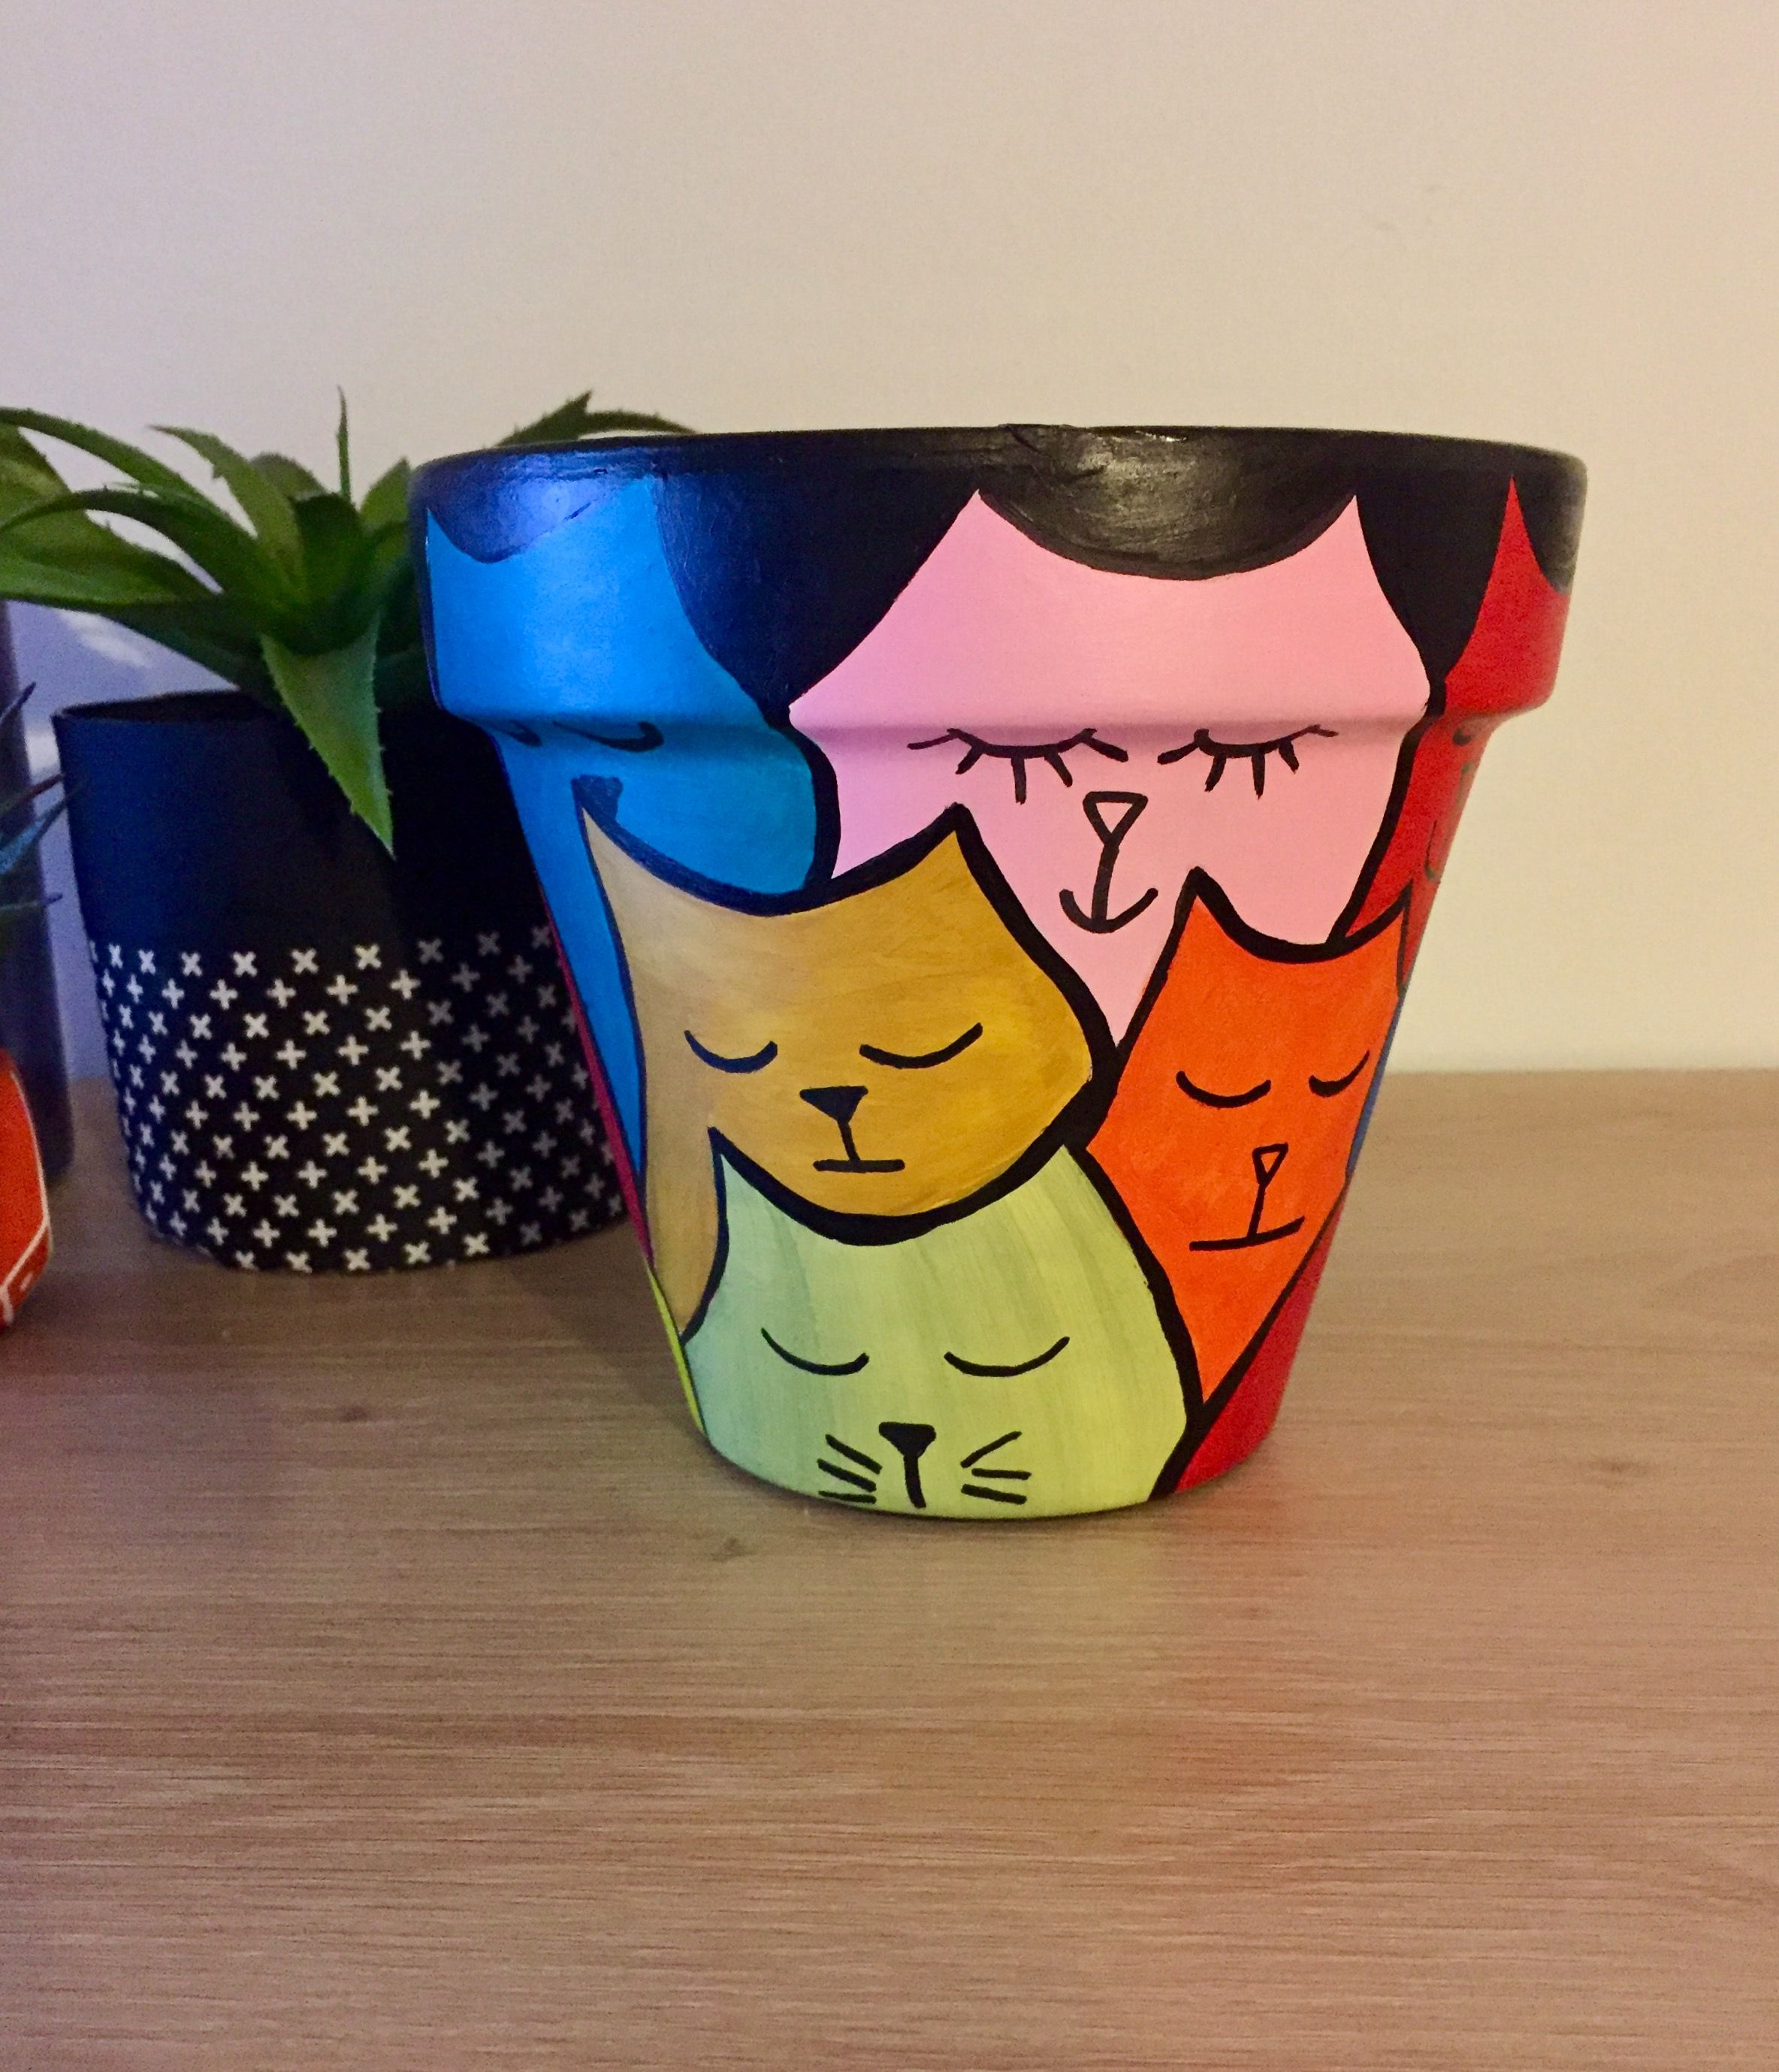 pin by wendy huston on wendy 39 s pots pinterest pots de. Black Bedroom Furniture Sets. Home Design Ideas